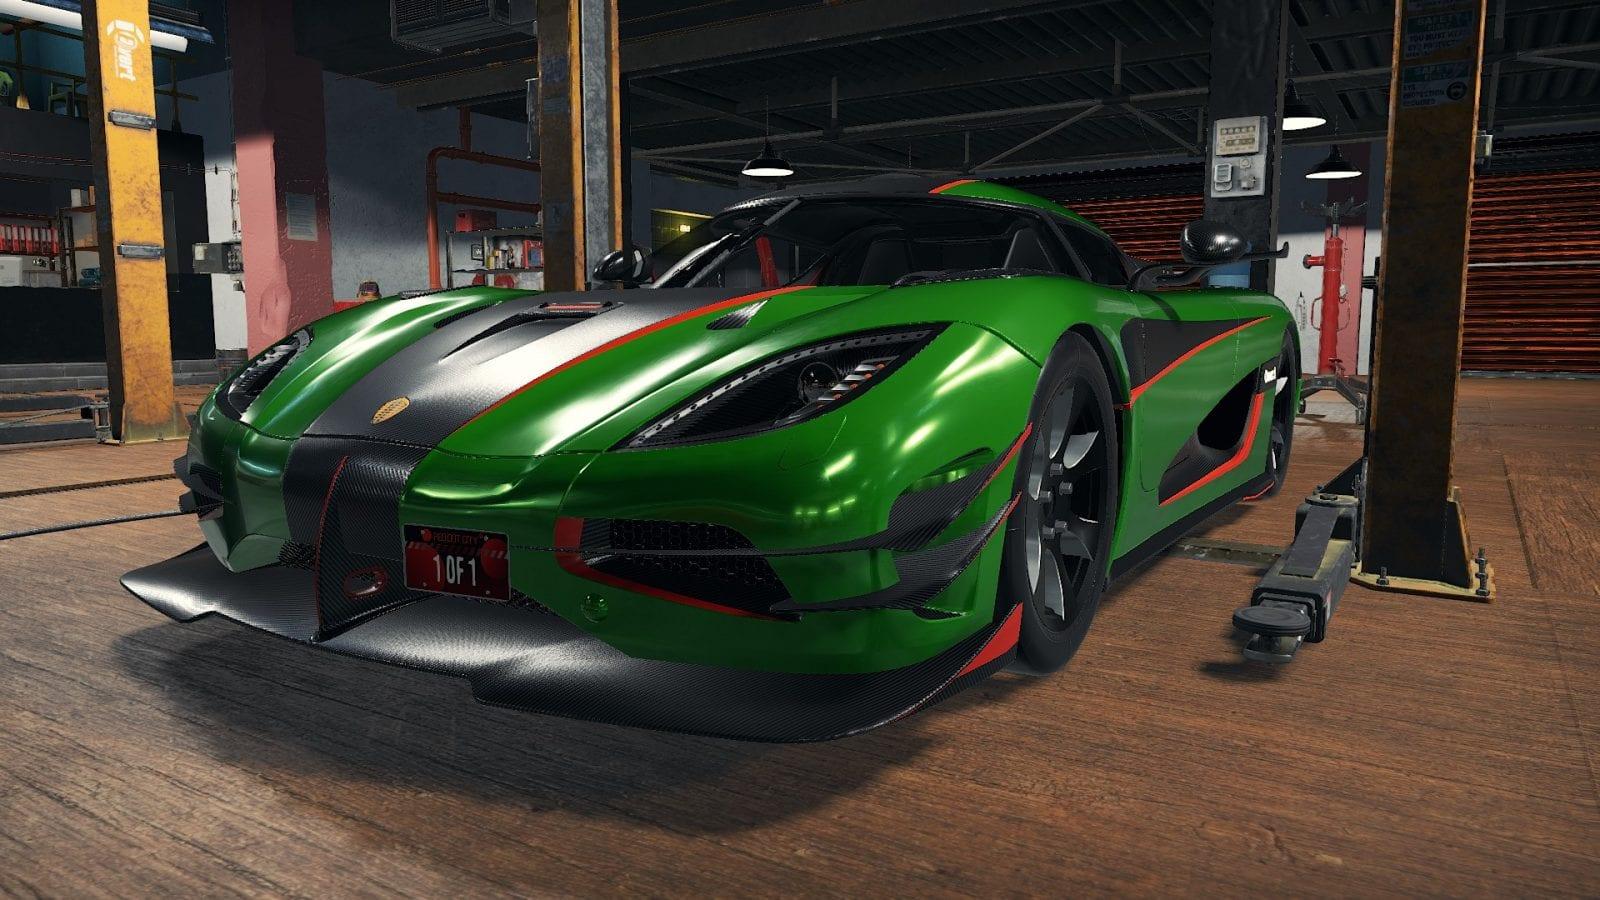 Car Mechanic Simulator 2015 Mods >> Koenigsegg One 1 Mod For Car Mechanic Simulator 2018